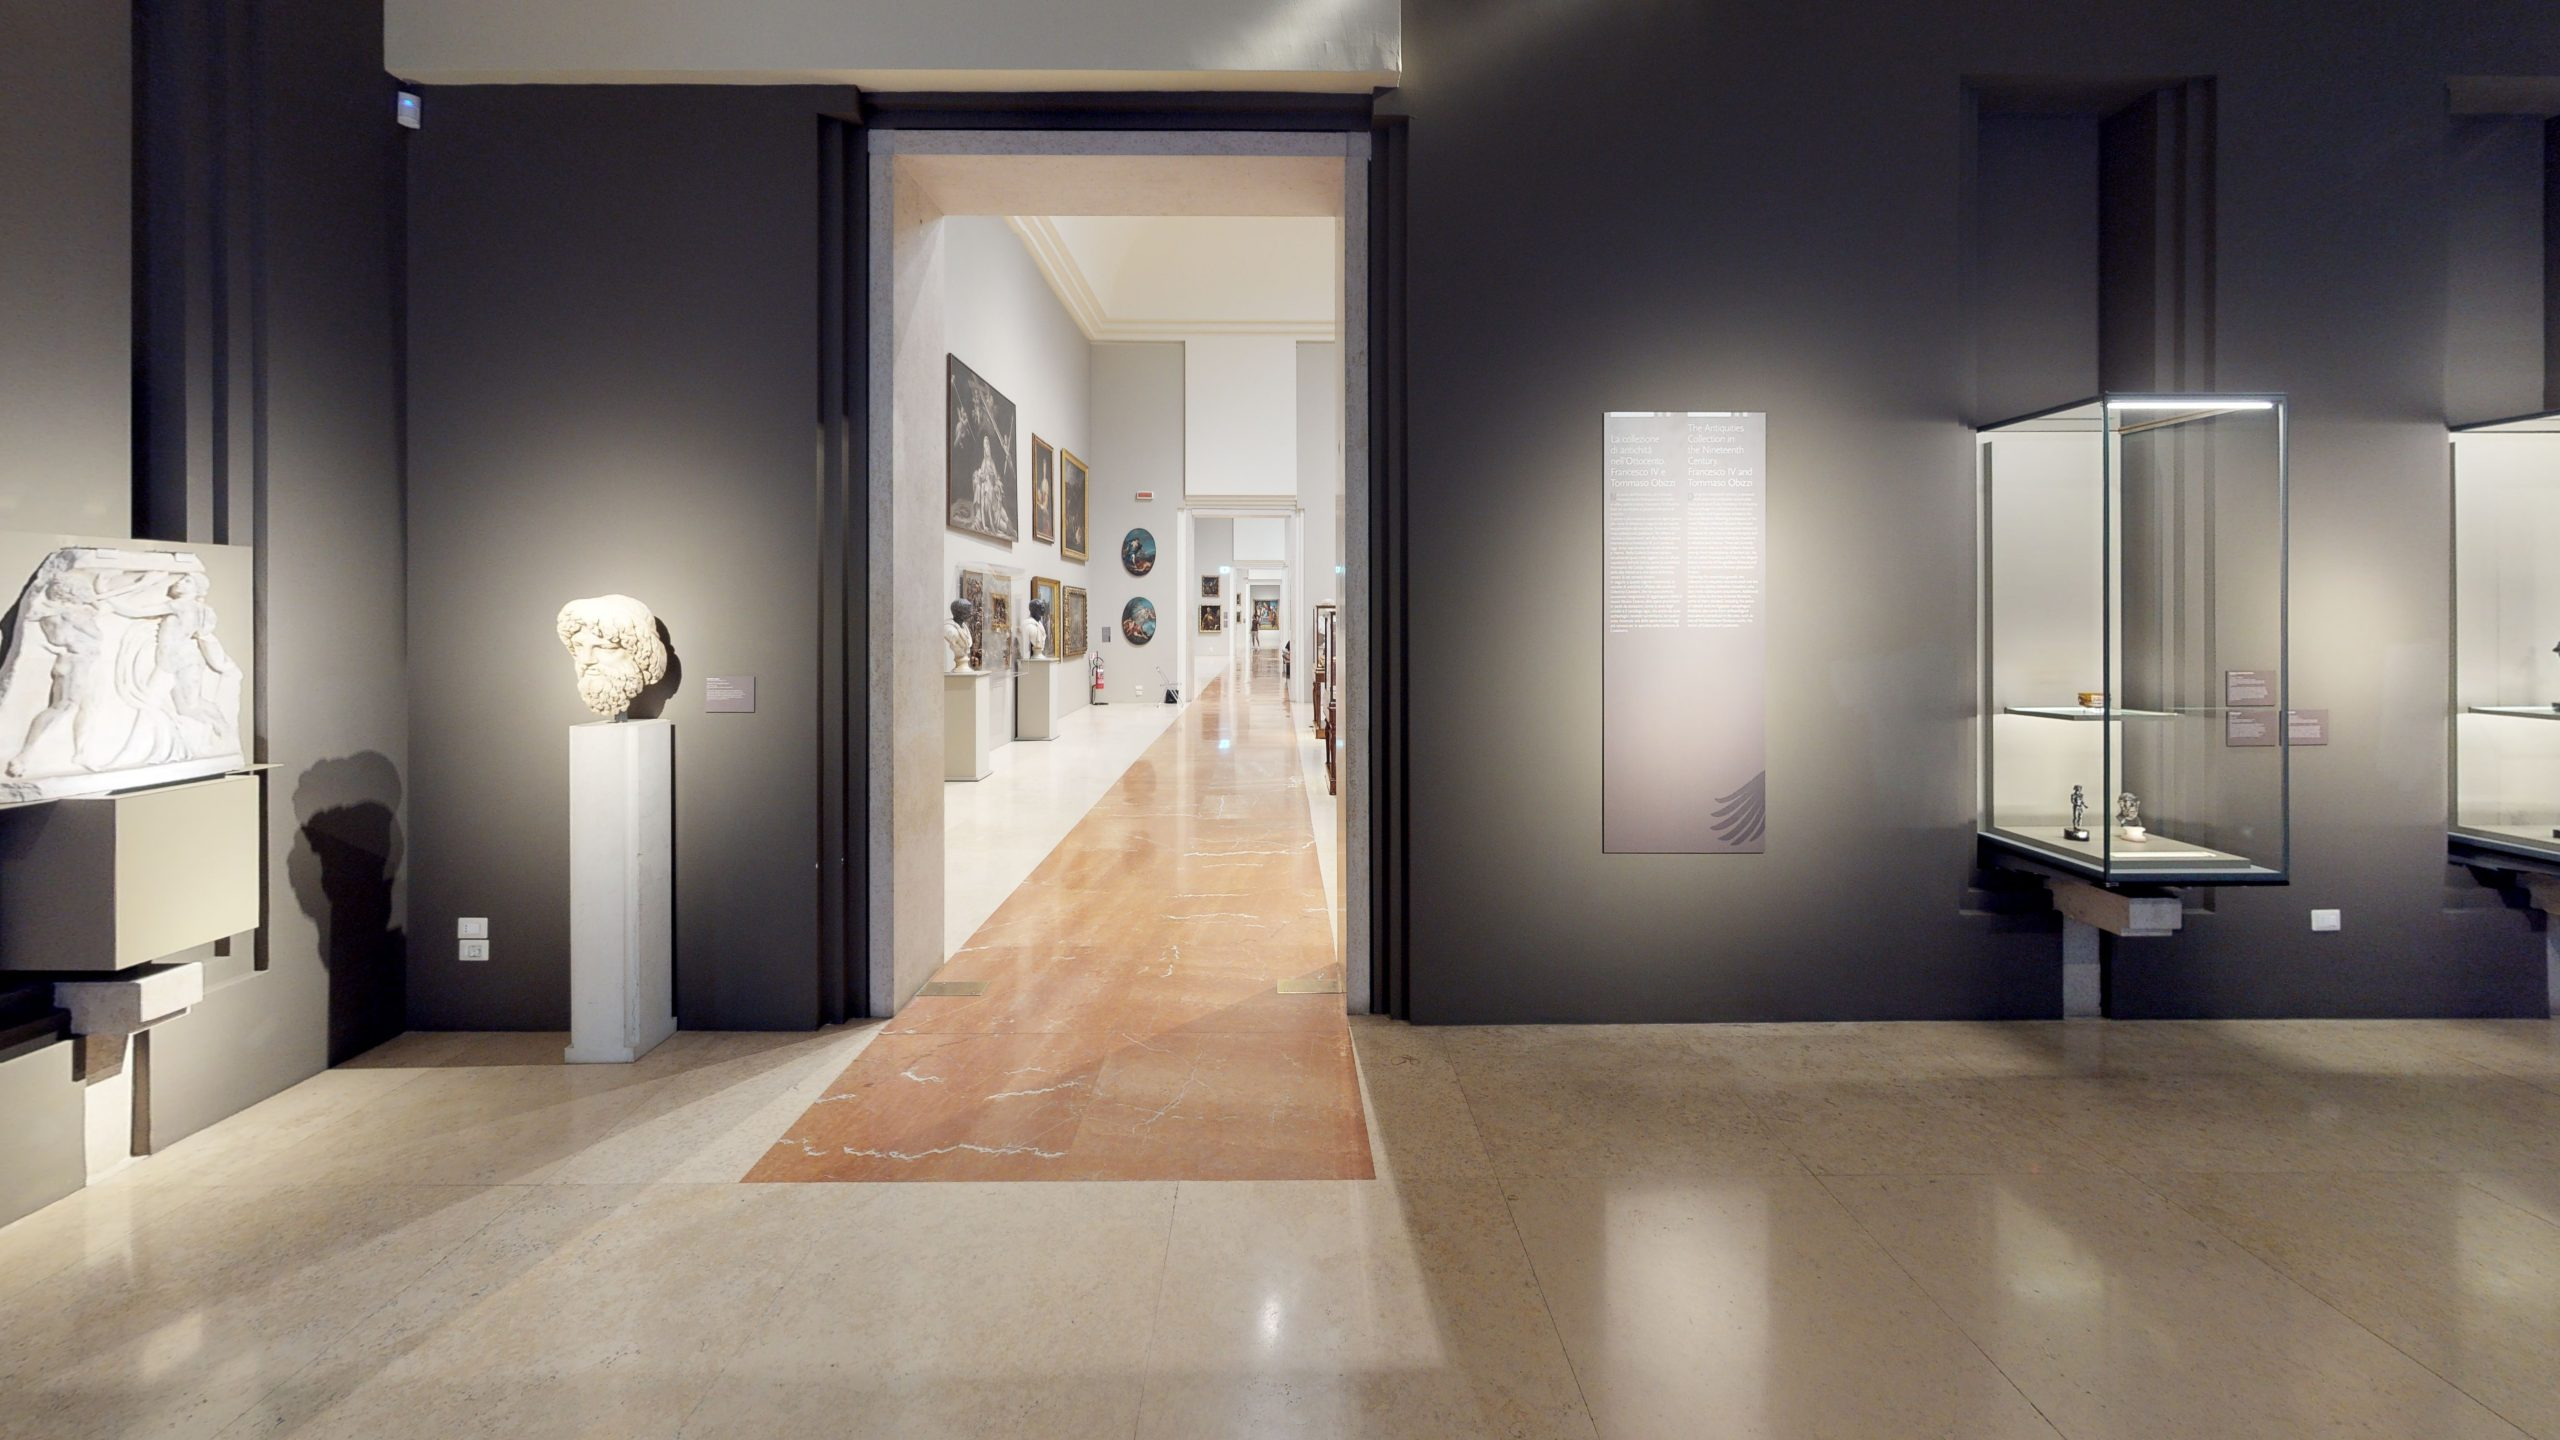 Gallerie Estensi di Modena